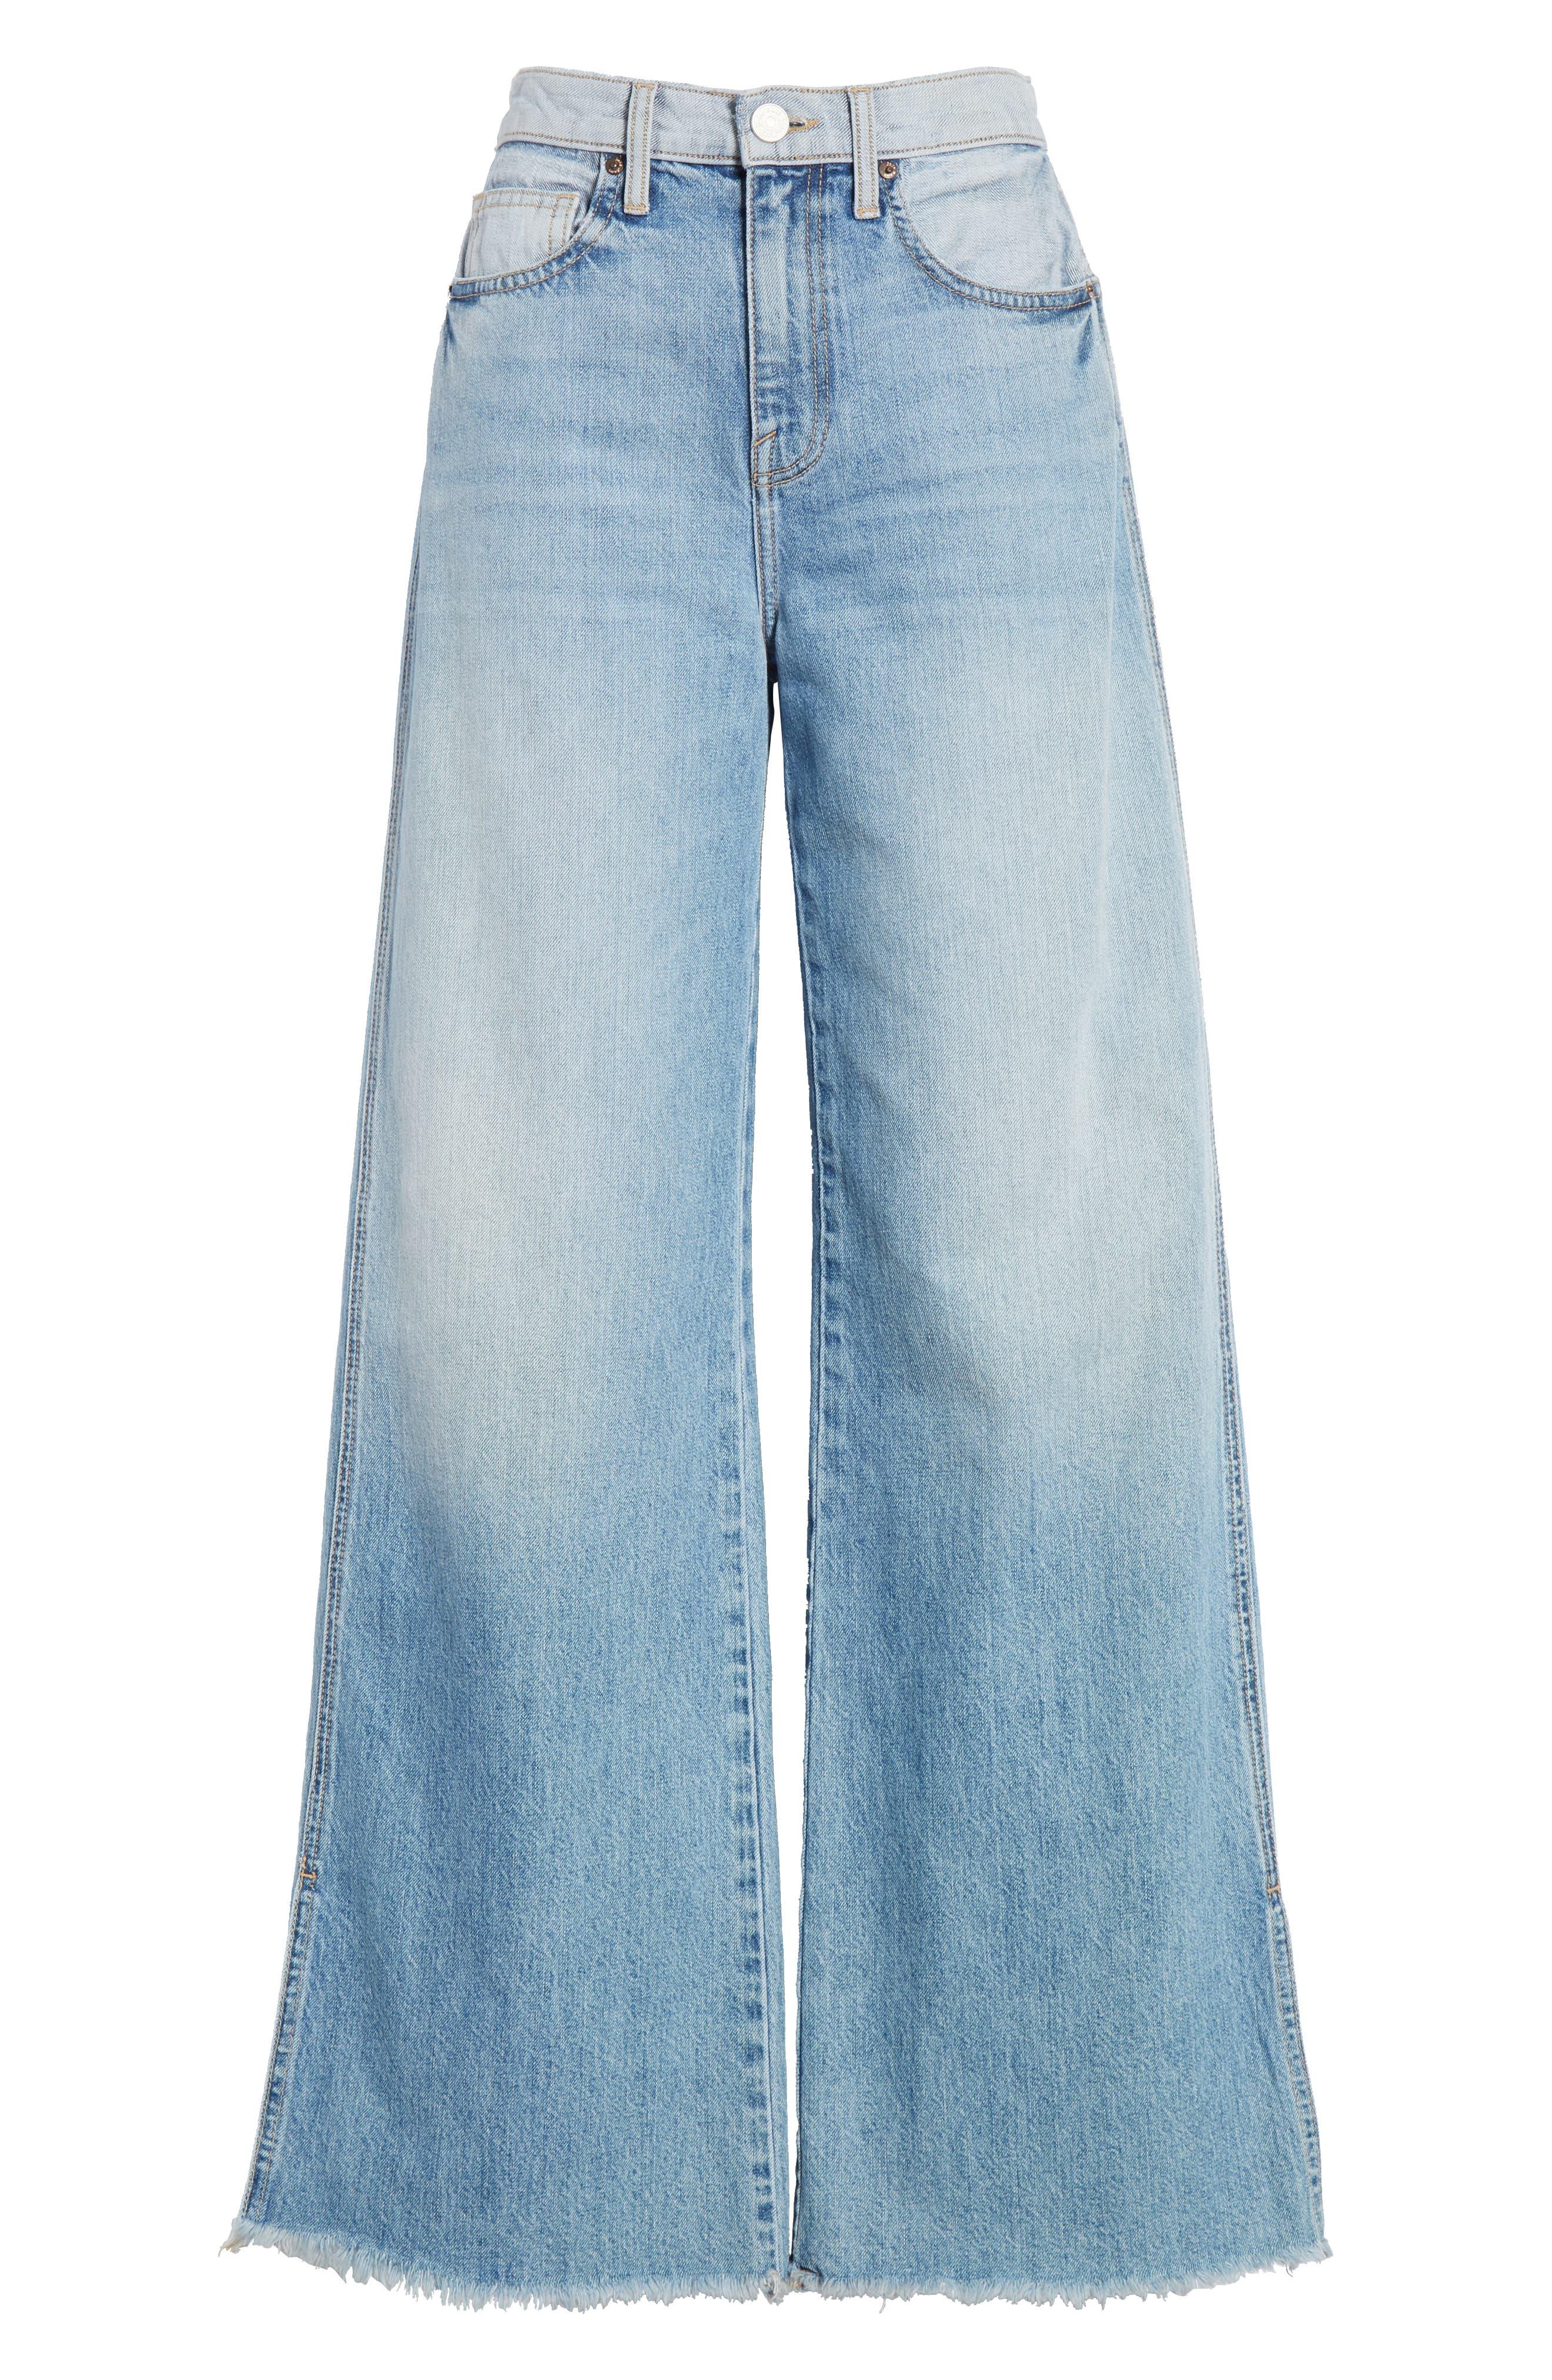 Isemene Wide Leg Jeans,                             Alternate thumbnail 7, color,                             450